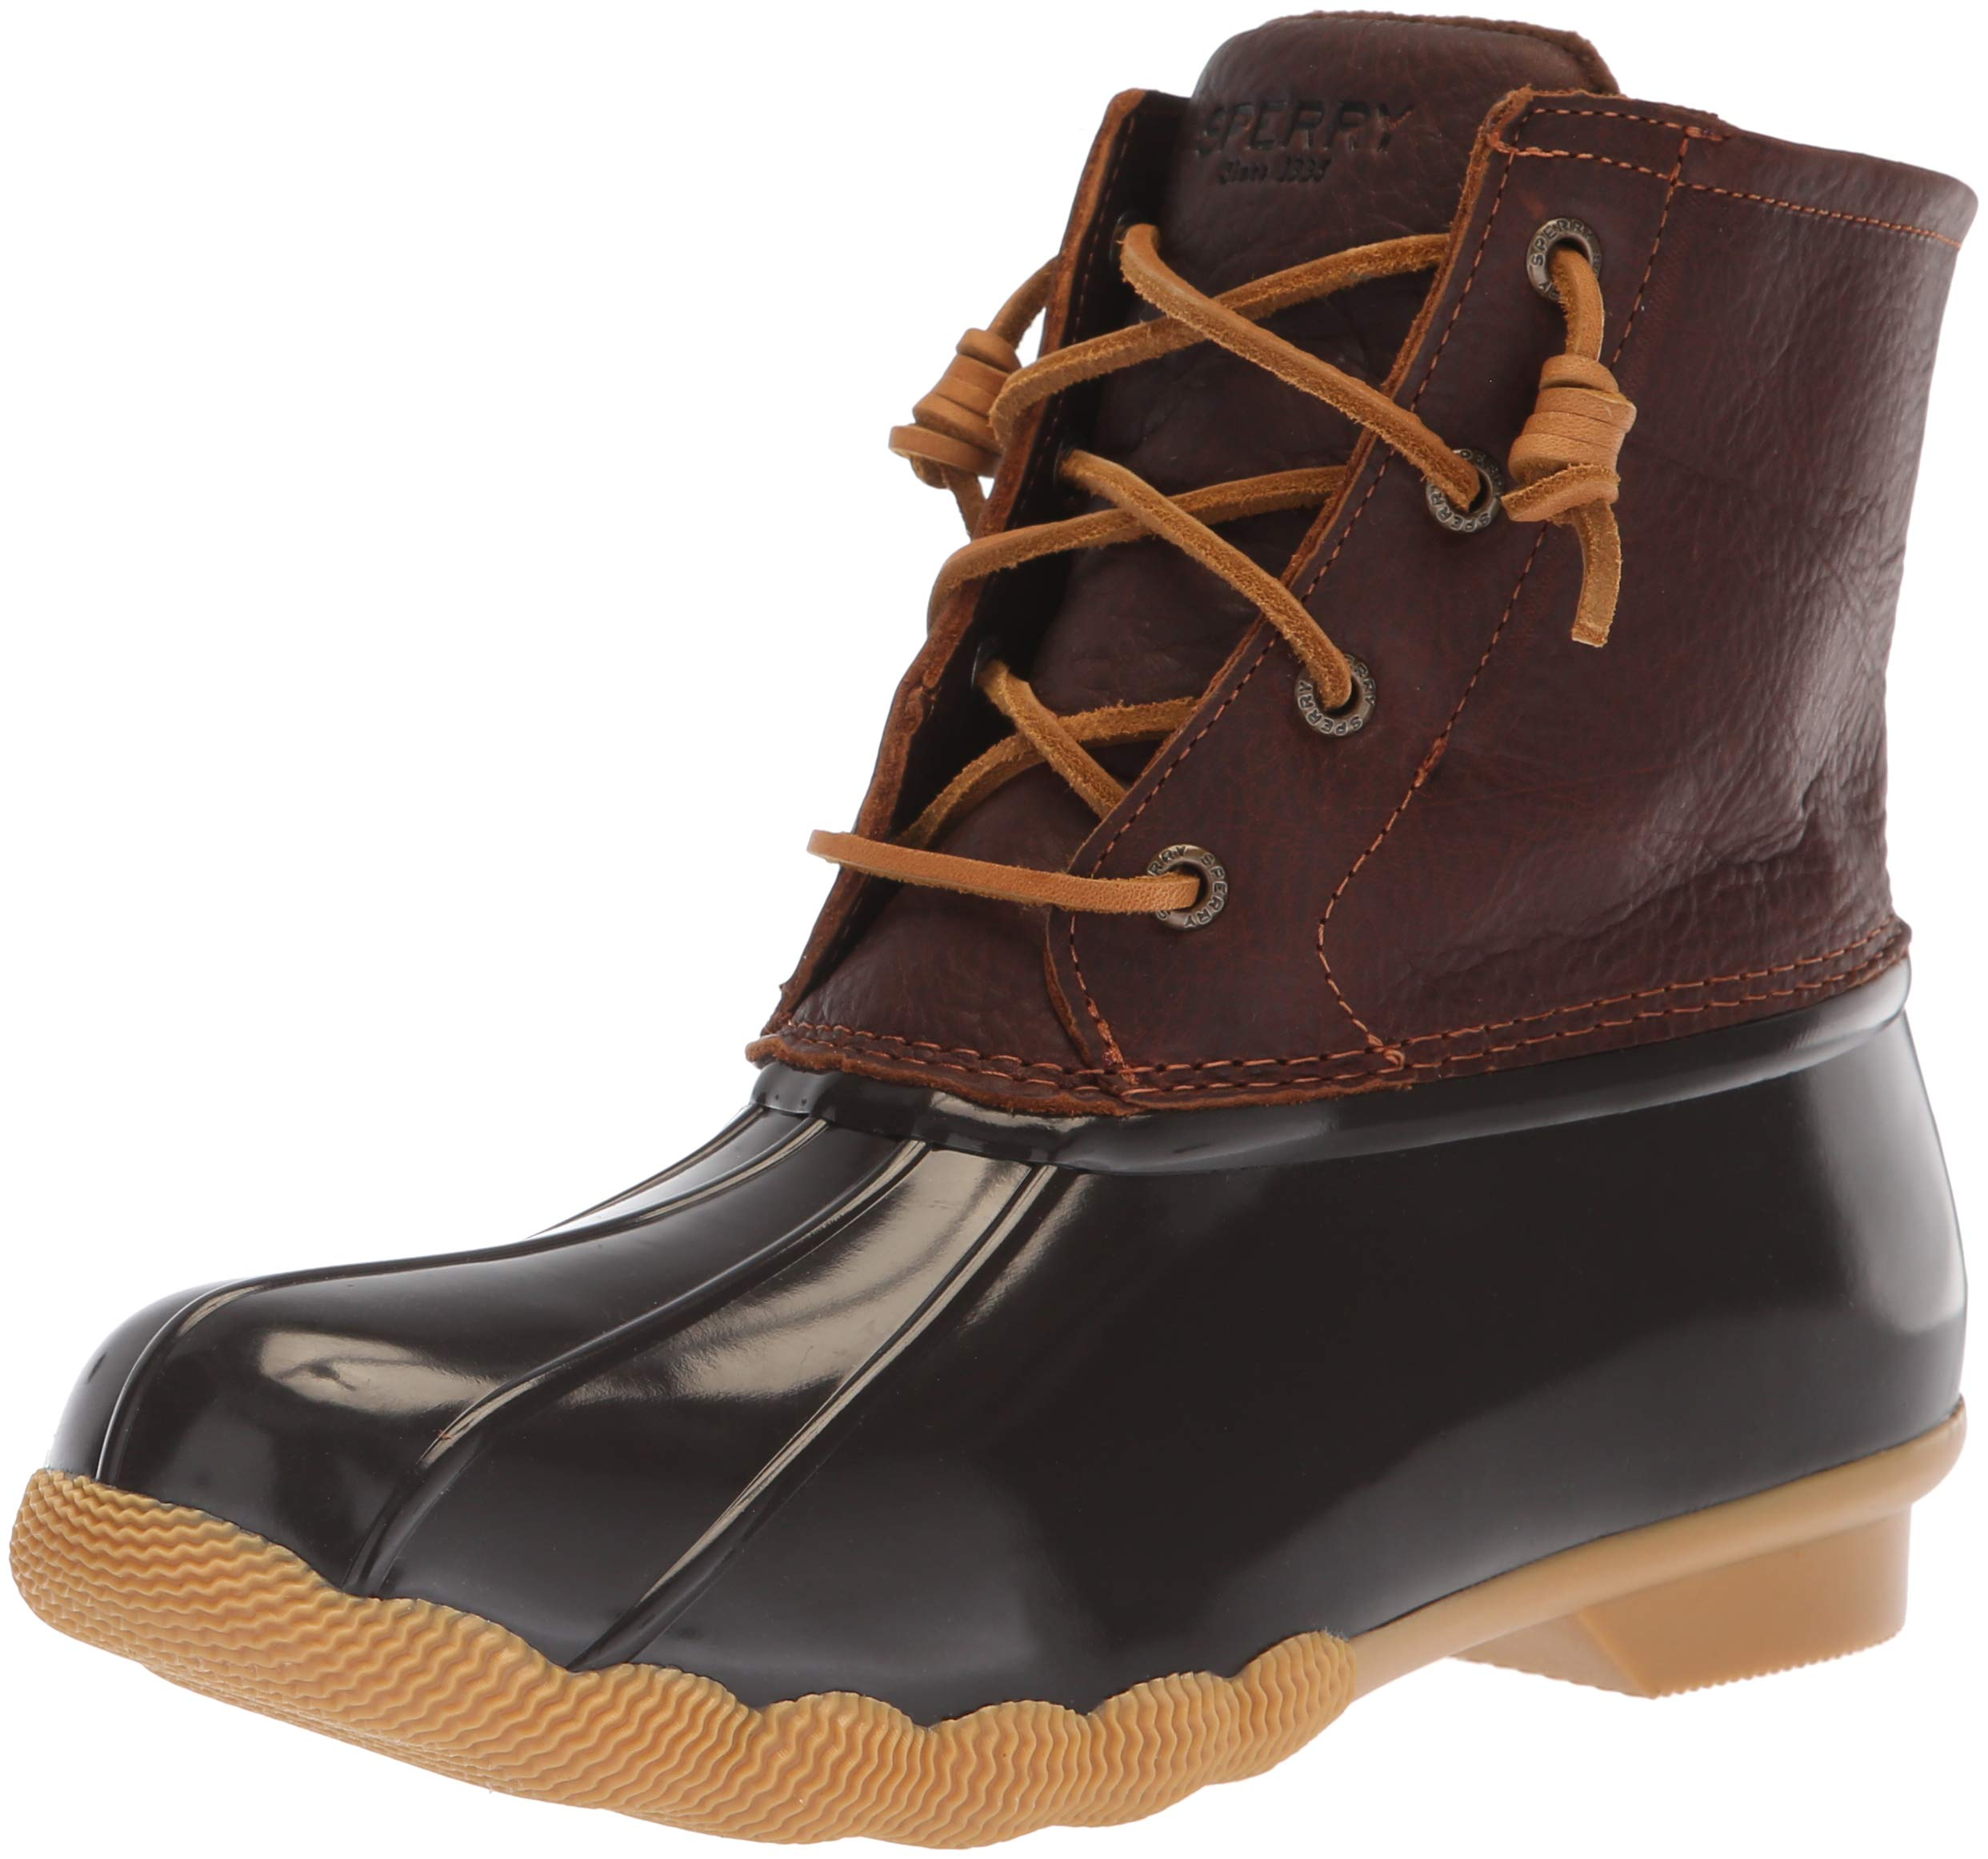 Sperry Top-Sider Women's Saltwater Rain Boot, Tan/Dark Brown, 9 Wide US